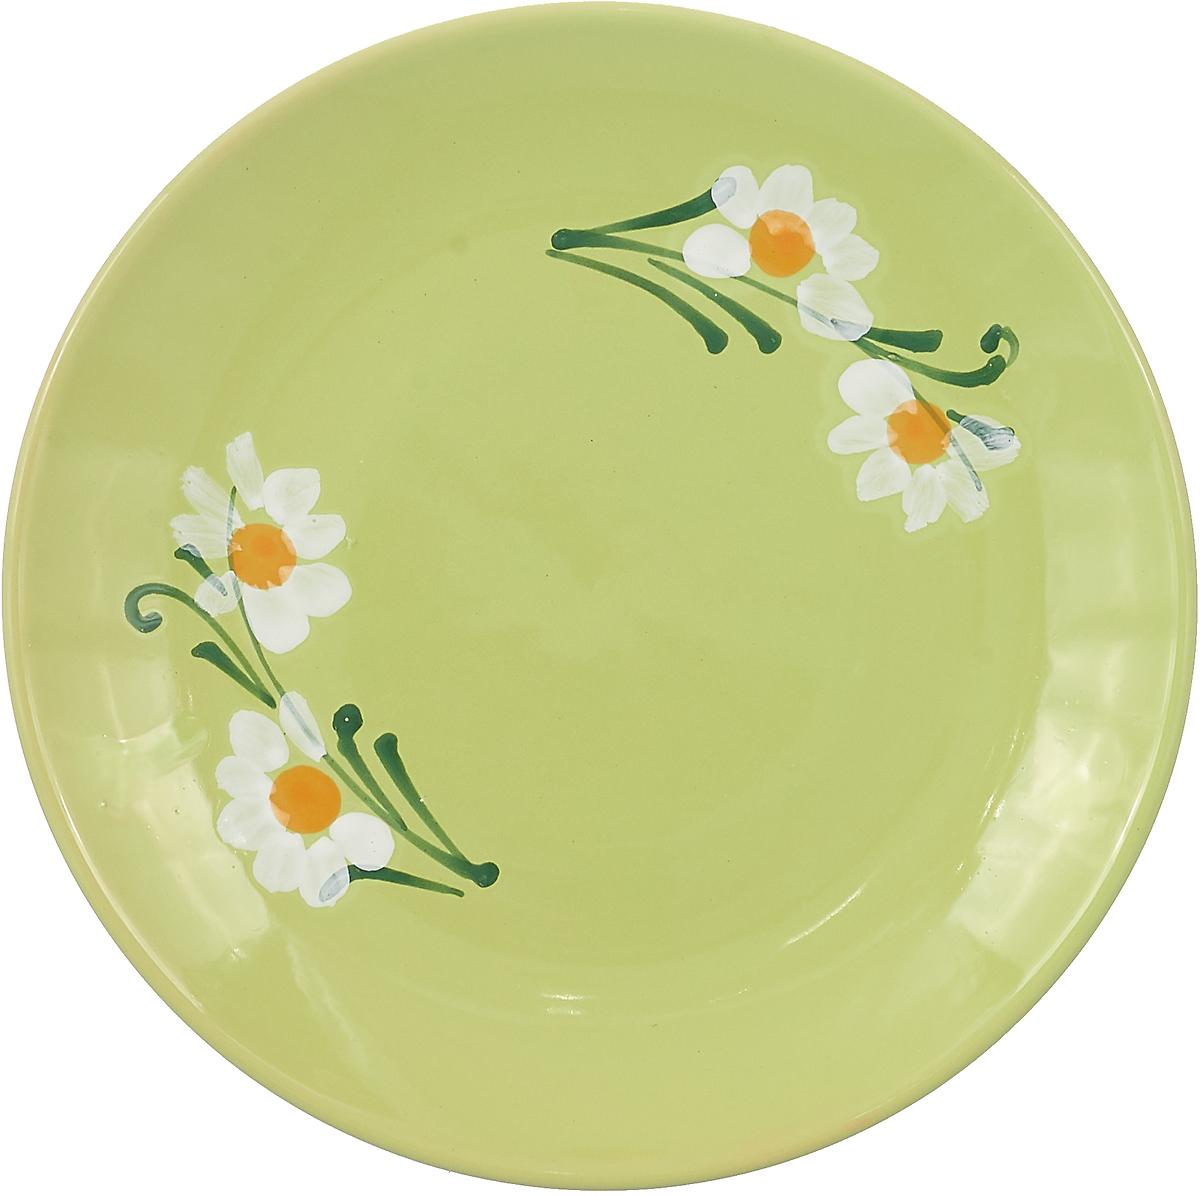 "Тарелка Борисовская керамика ""Cтандарт"", цвет: салатовый, диаметр 23 см"